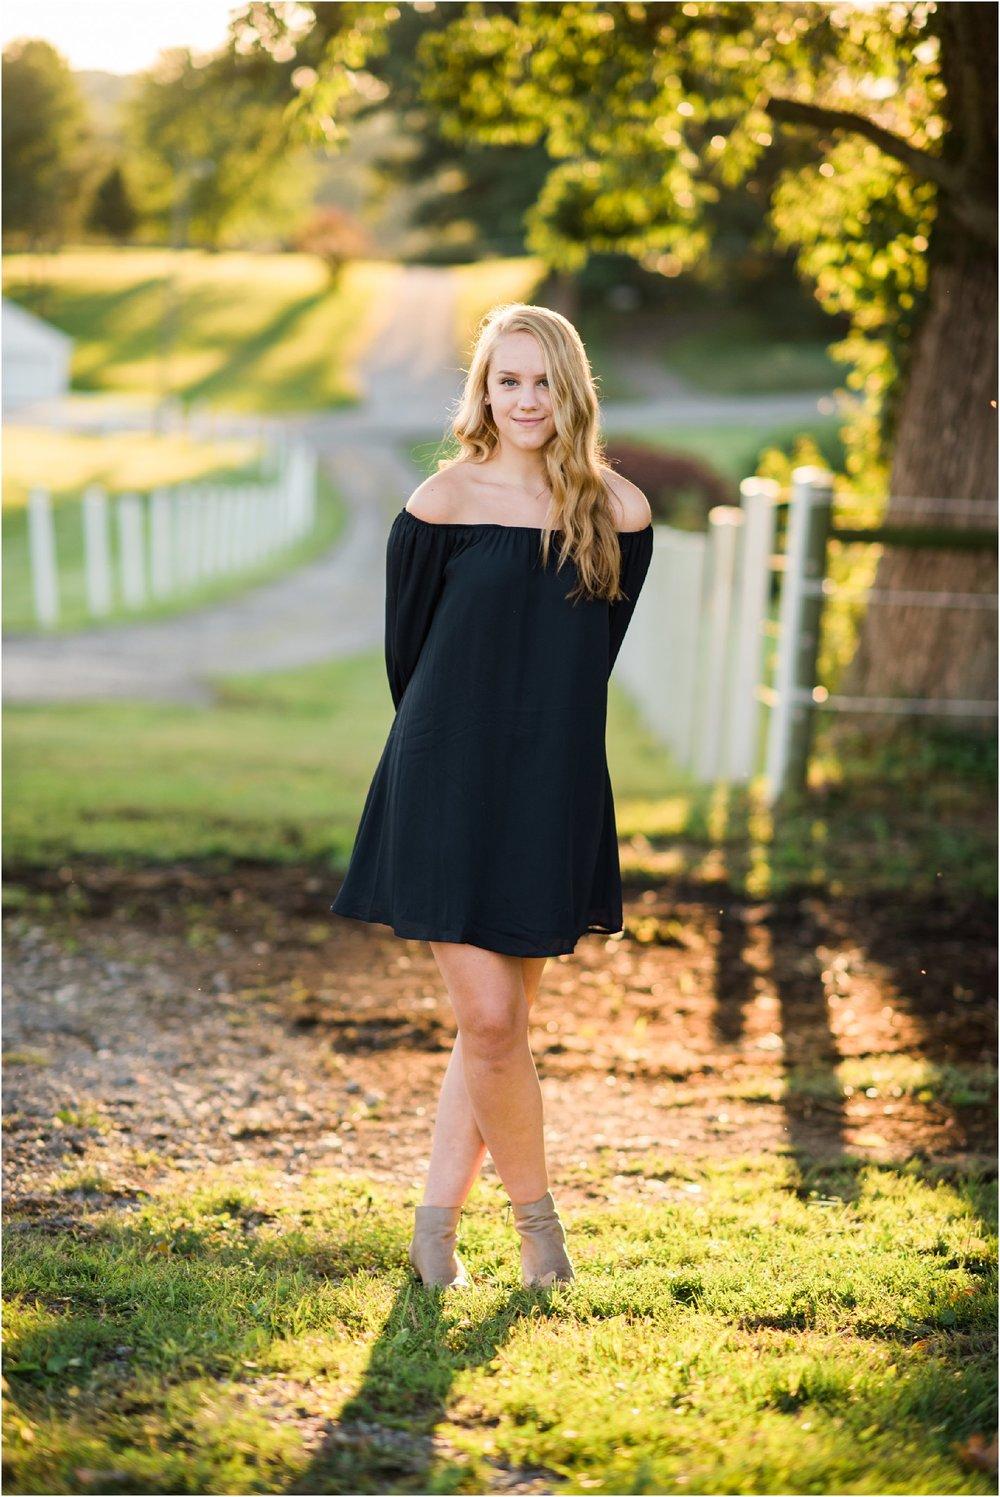 Pittsburgh Rachel Rossetti Senior Portrait Photography_0247.jpg